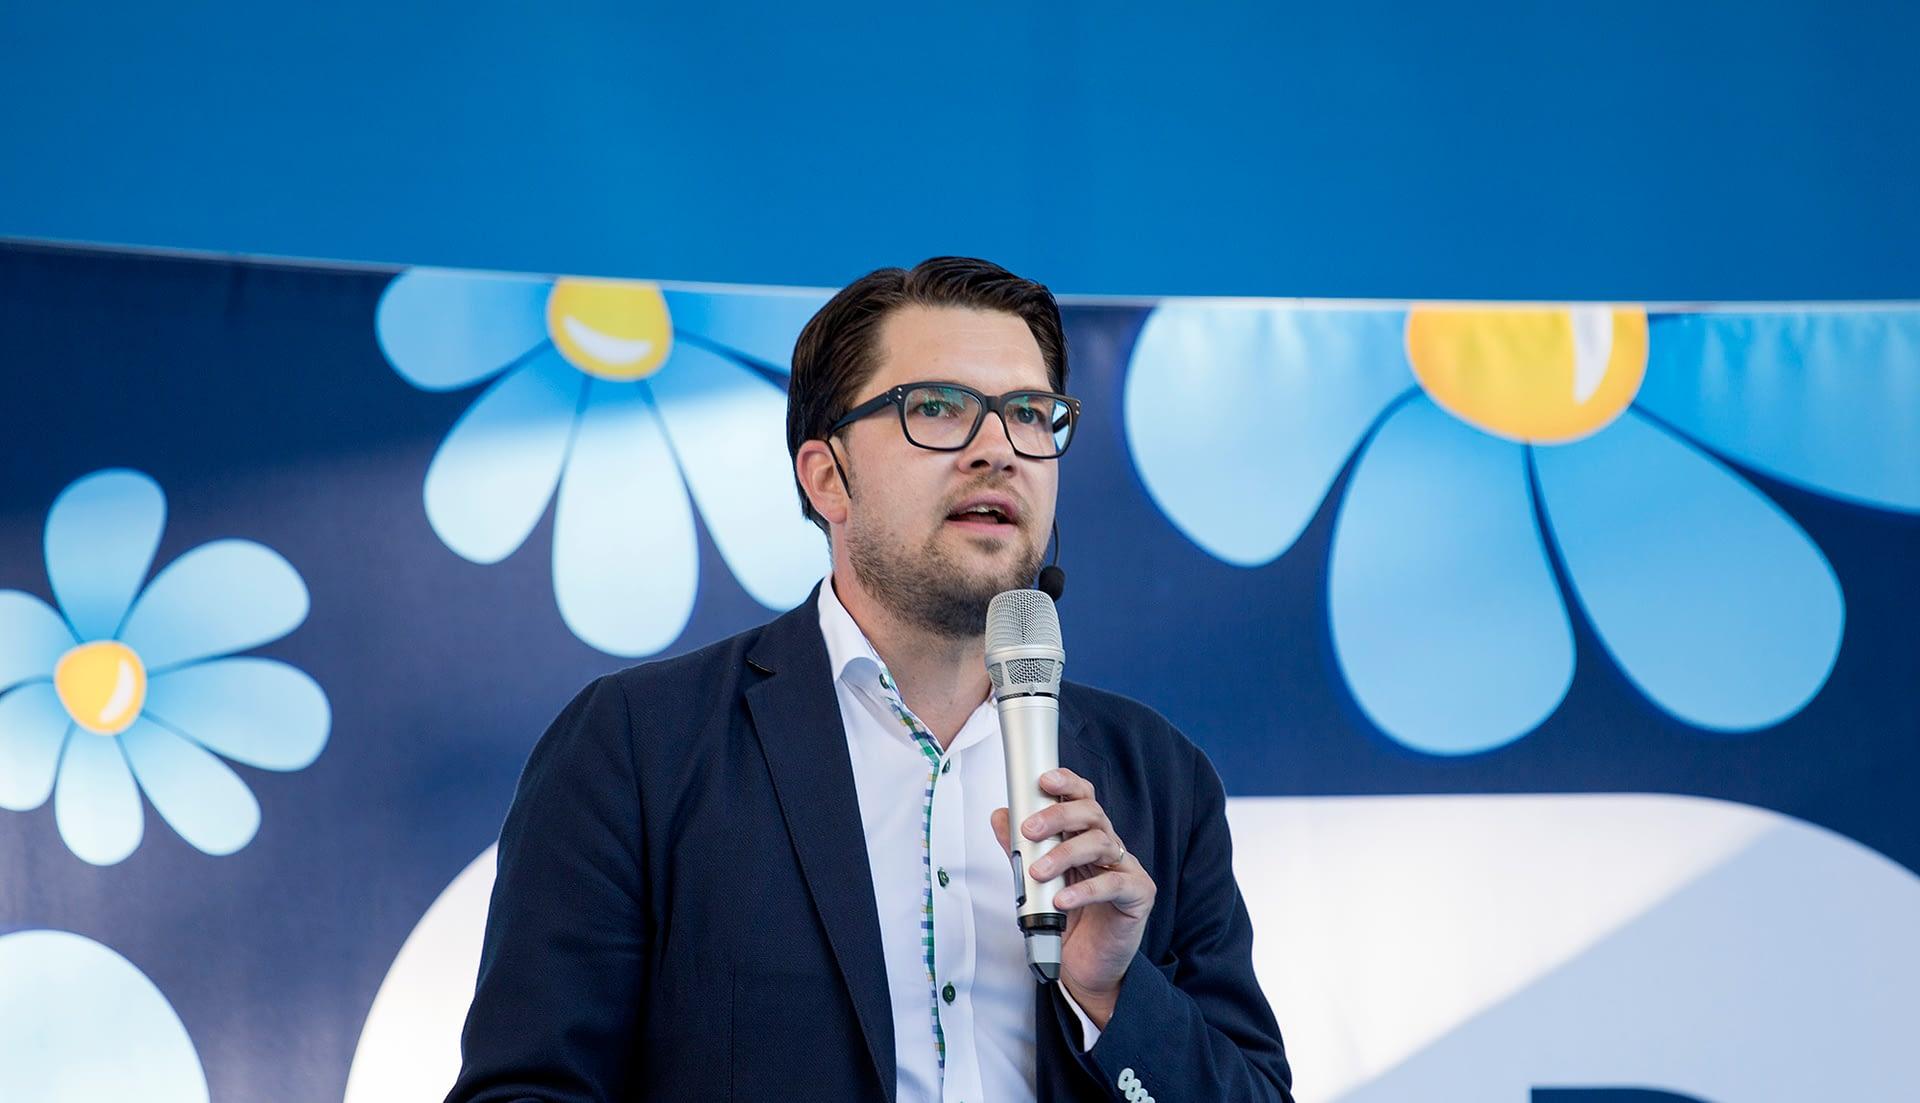 Jimmie Åkesson - authoritarian politician Sweden